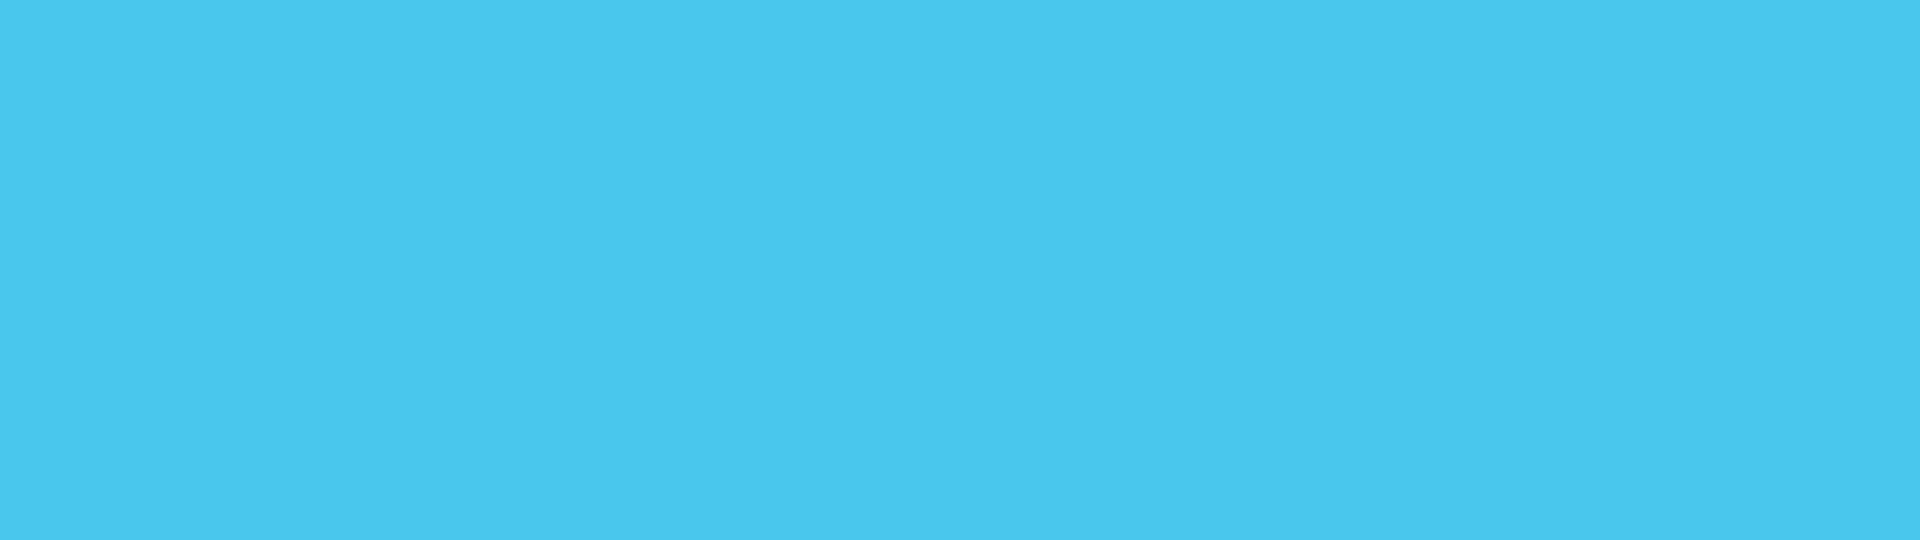 CATEGORY-ANNE-FISHERPRICE-05-12